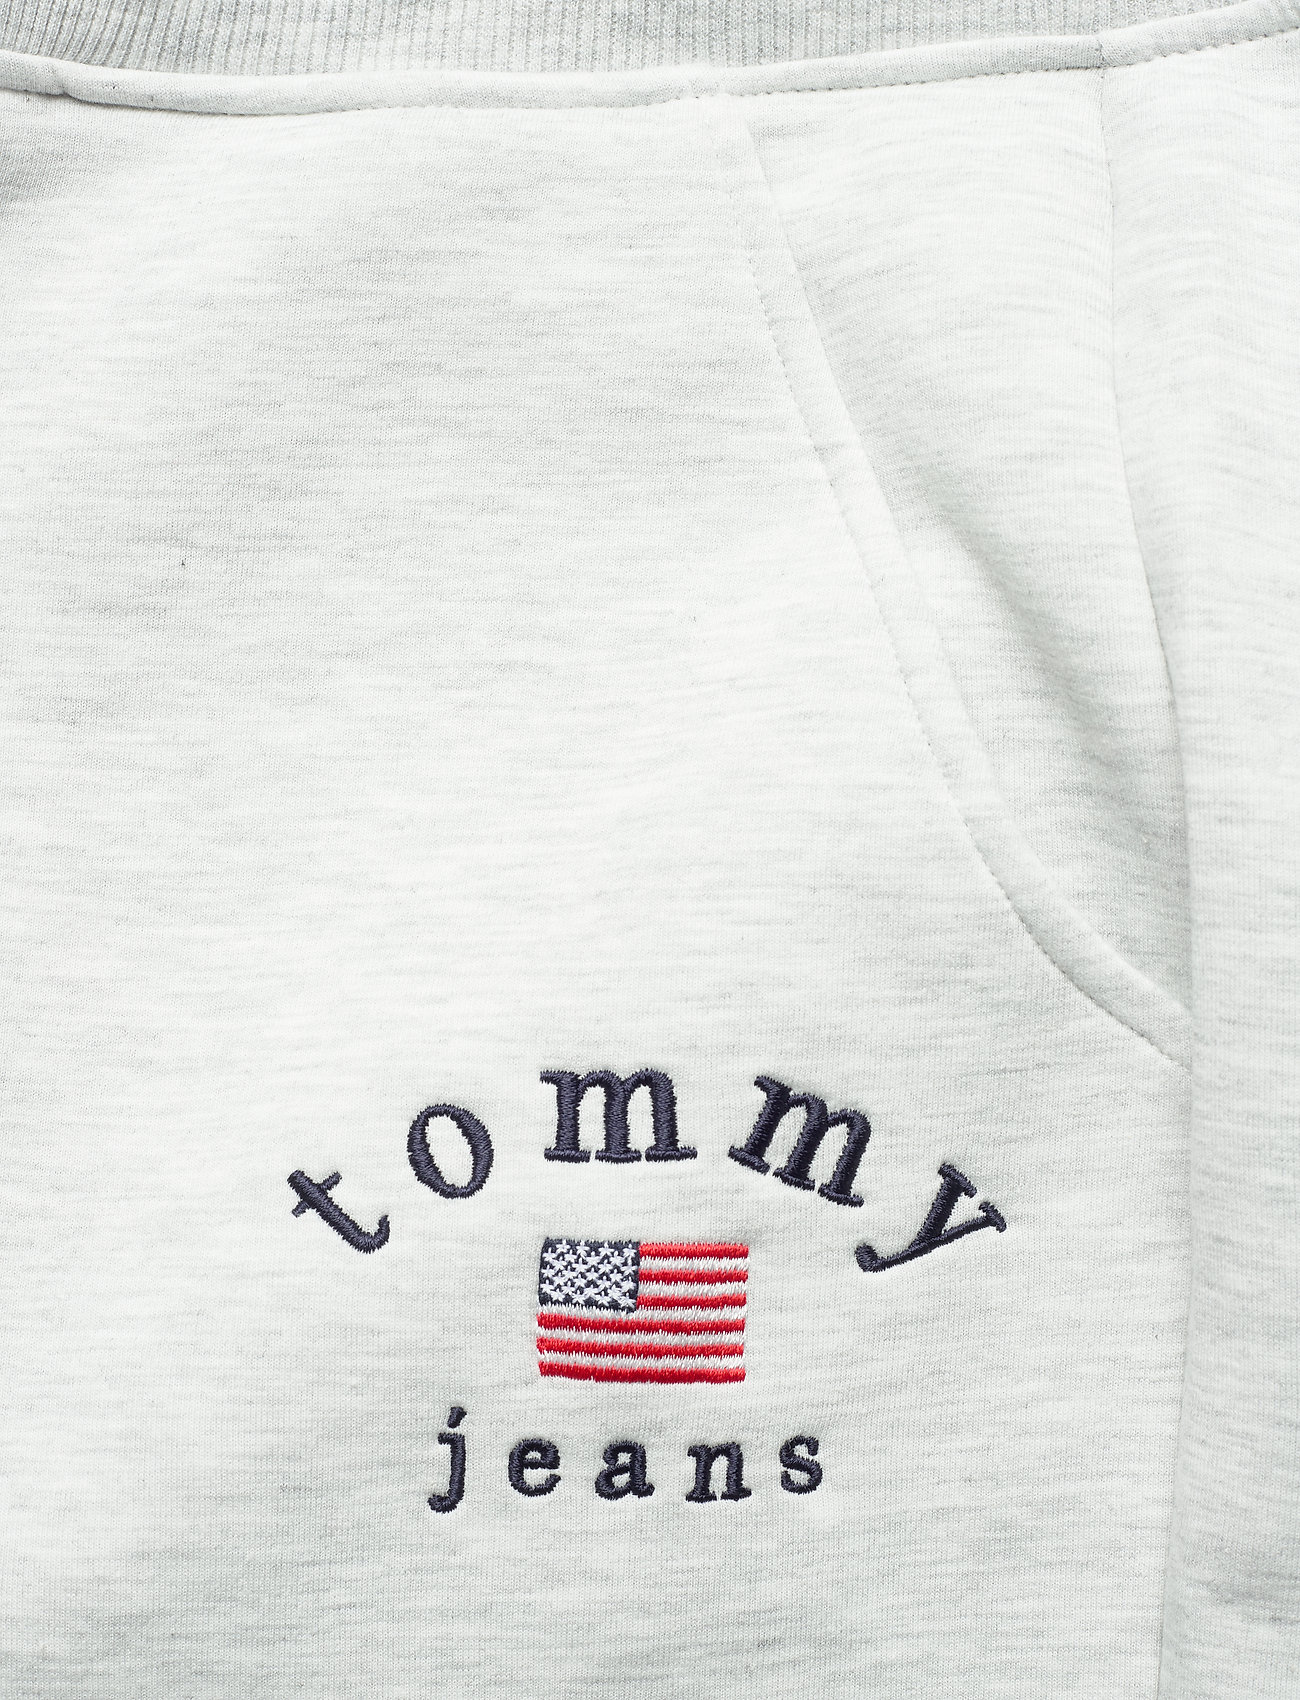 Grey Sweatpantpale HtrJeans Tommy Tjw JF3TlK1c